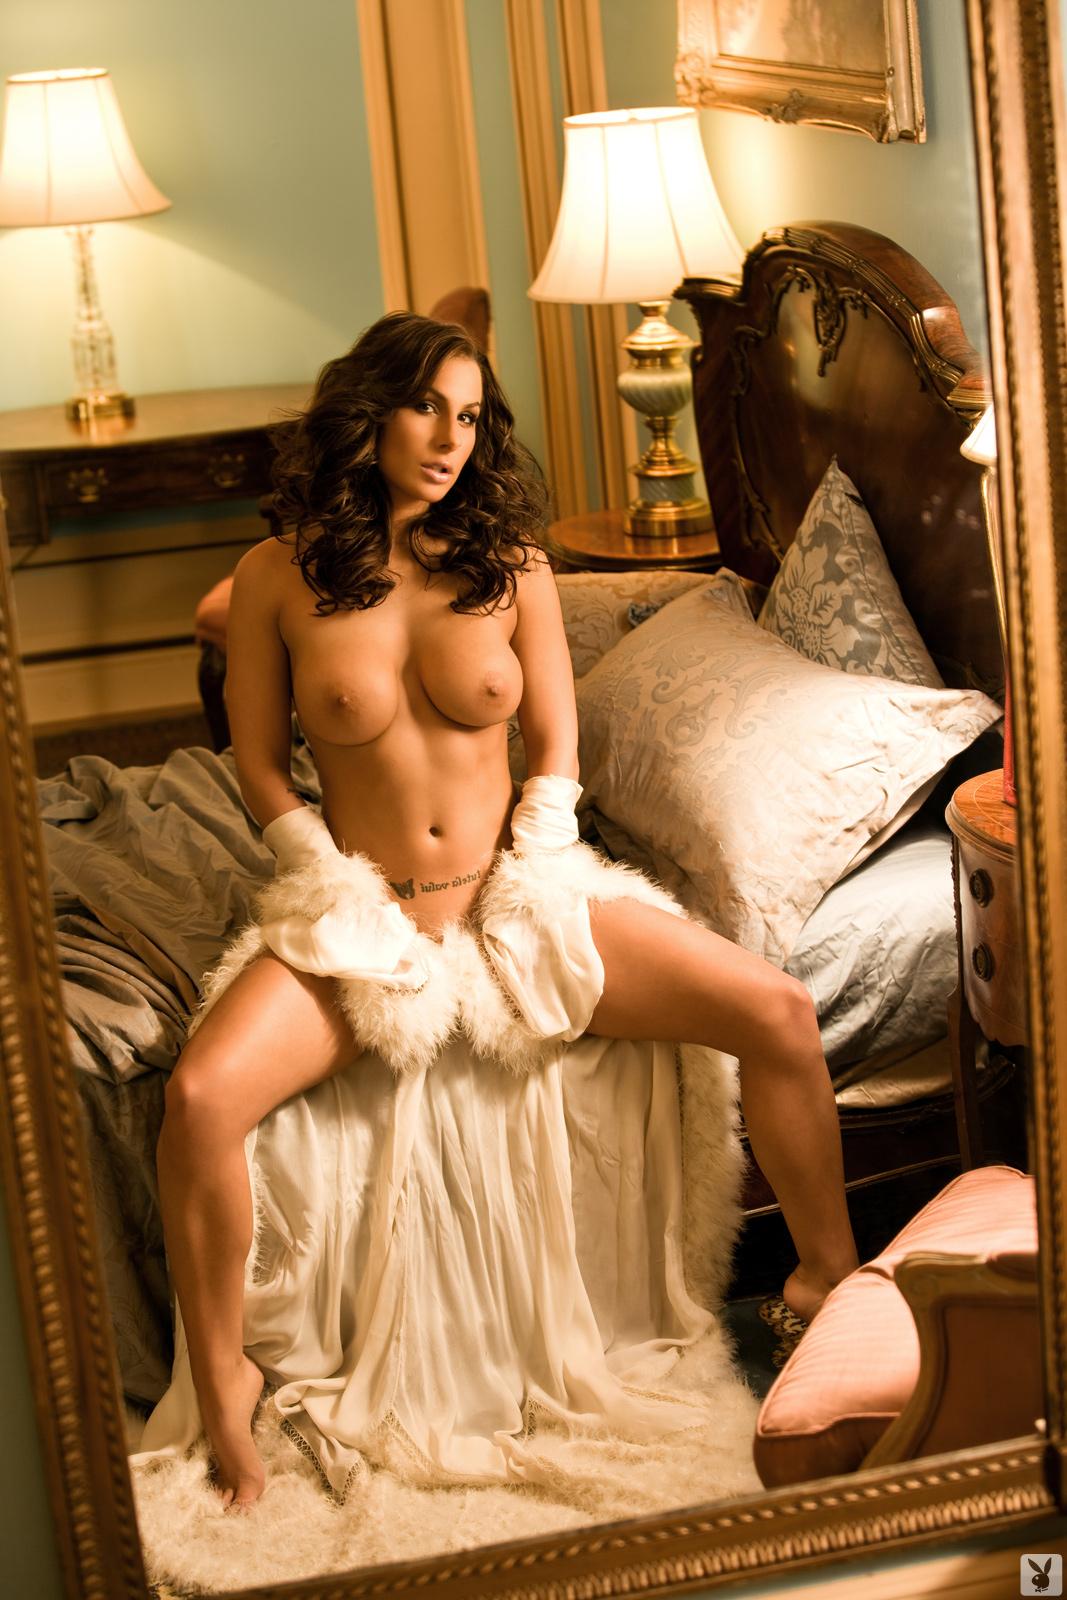 Very nude pictures of kristen dupre words... super